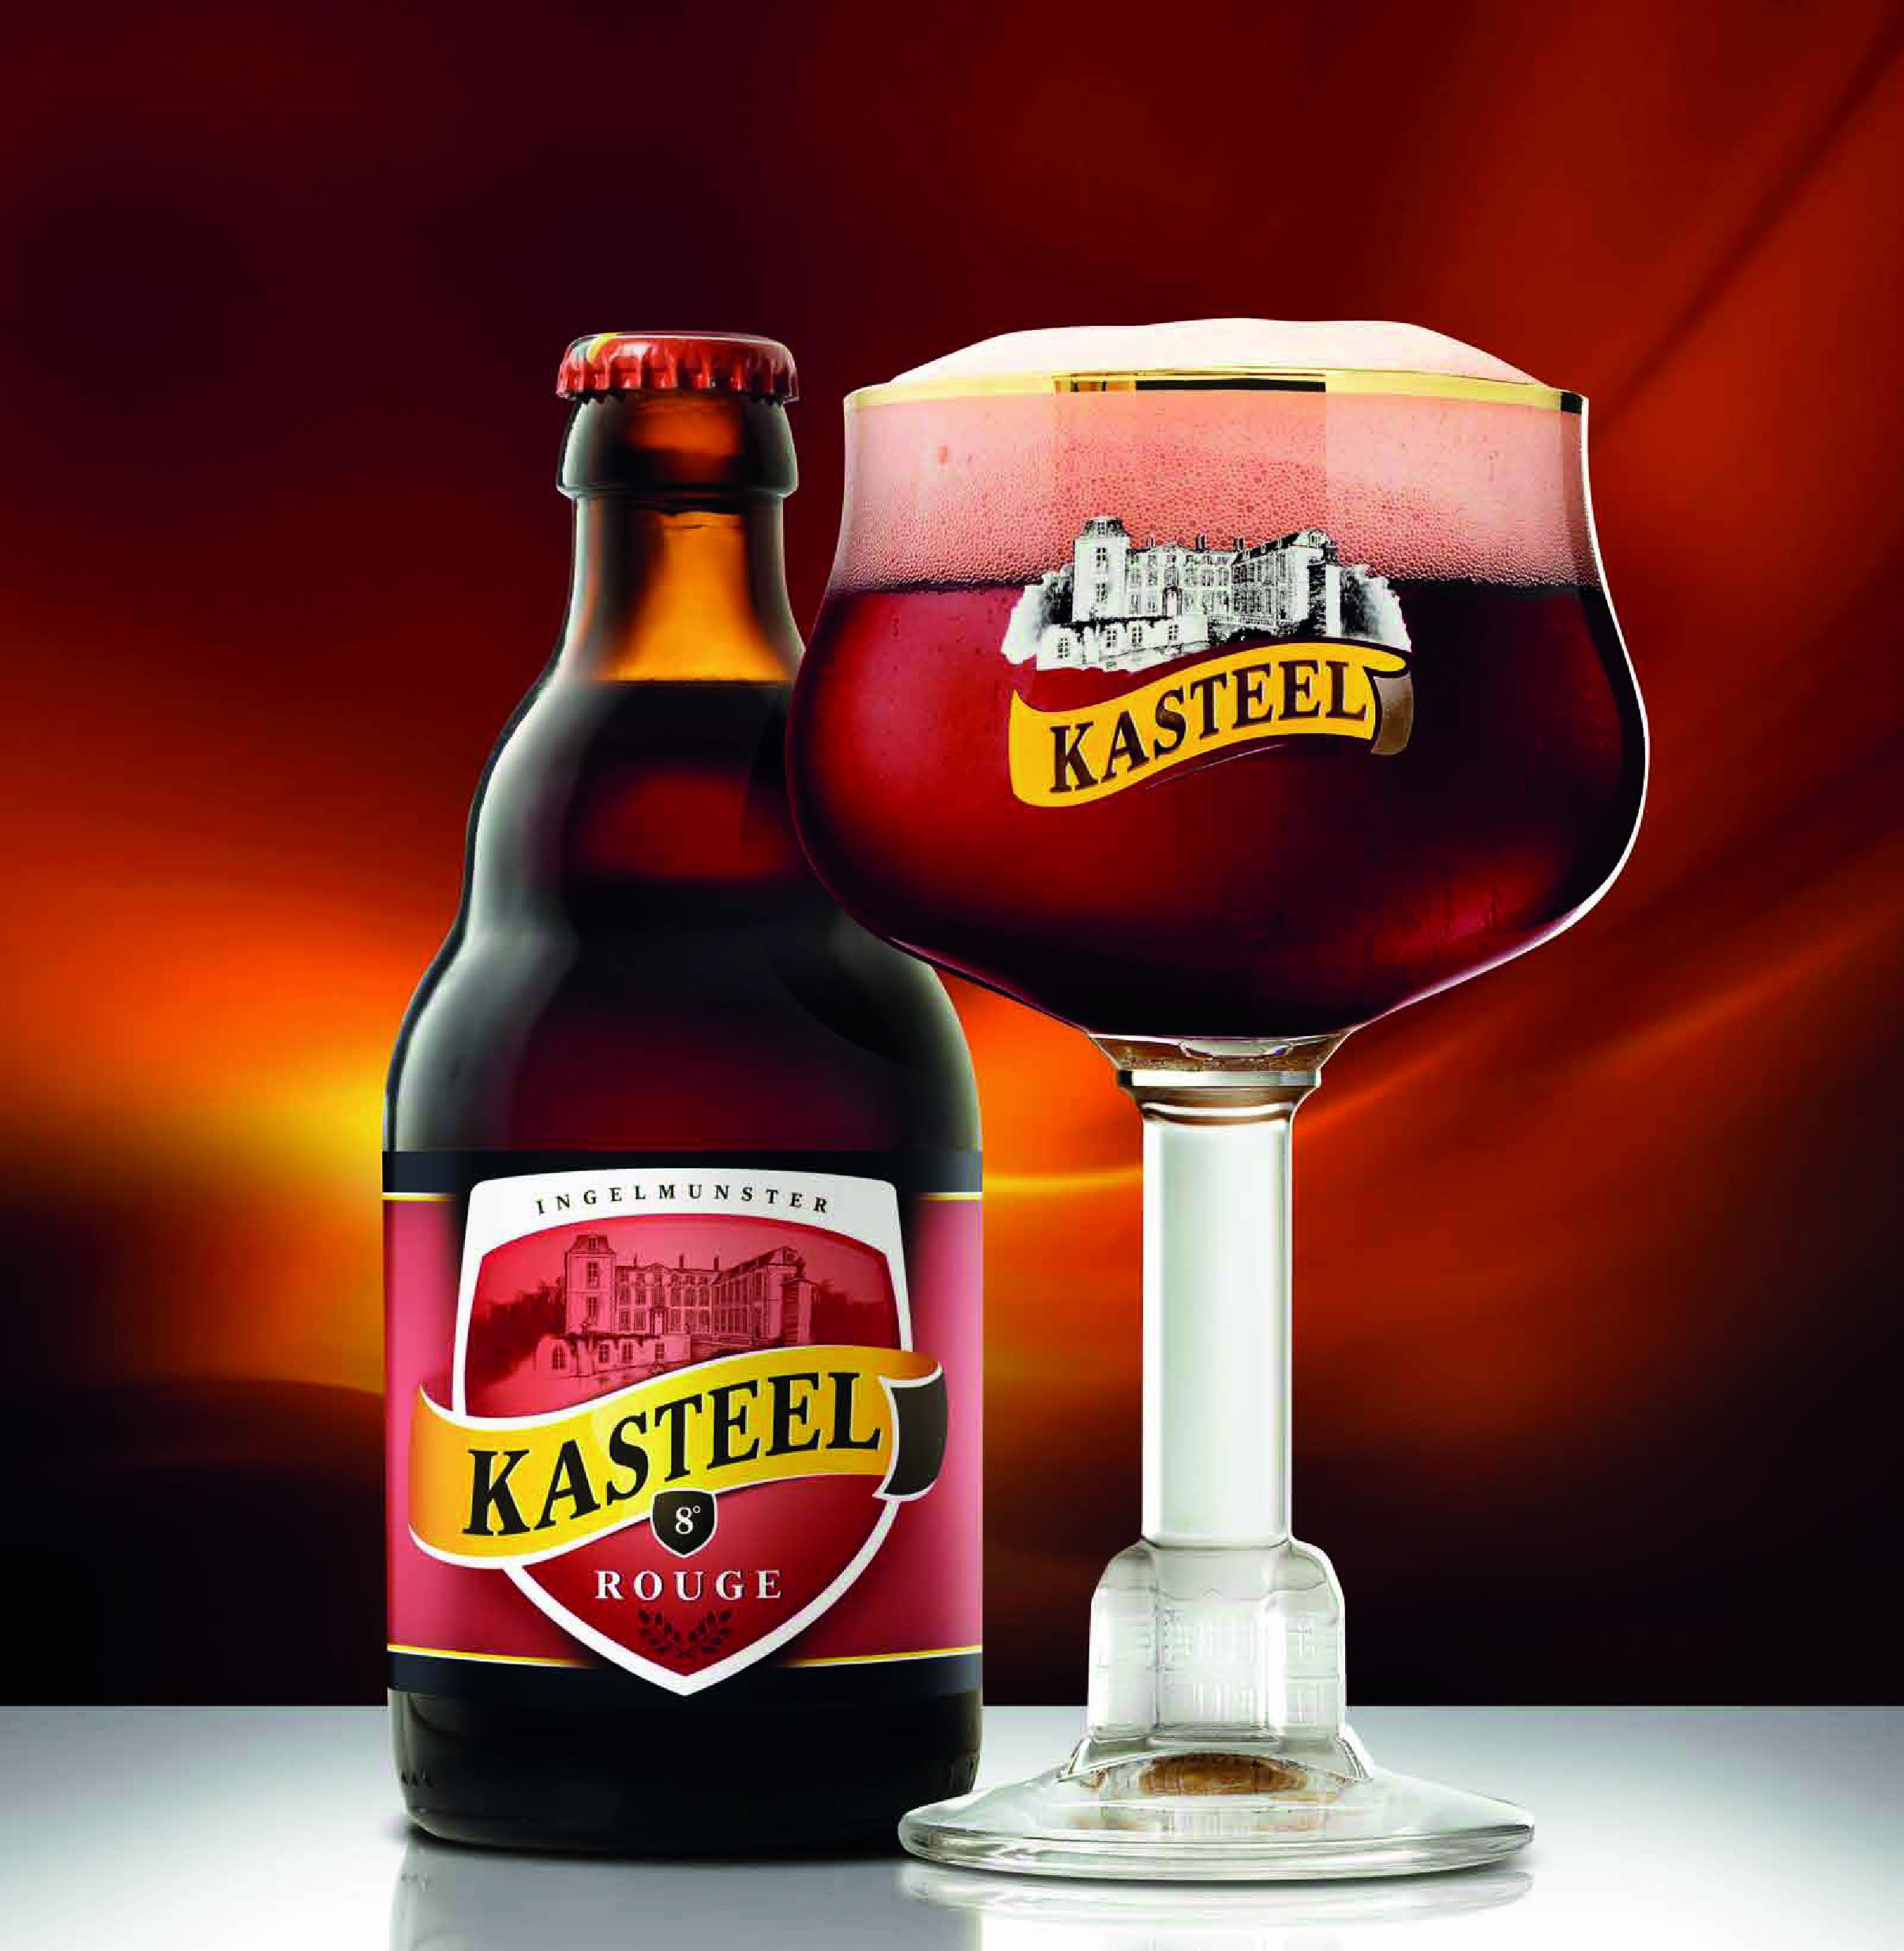 Brouwerij Van Honsebrouck Kasteel Rouge Fruit Beer 8 0 Pullo Kasteel Rouge Bier Kasteel